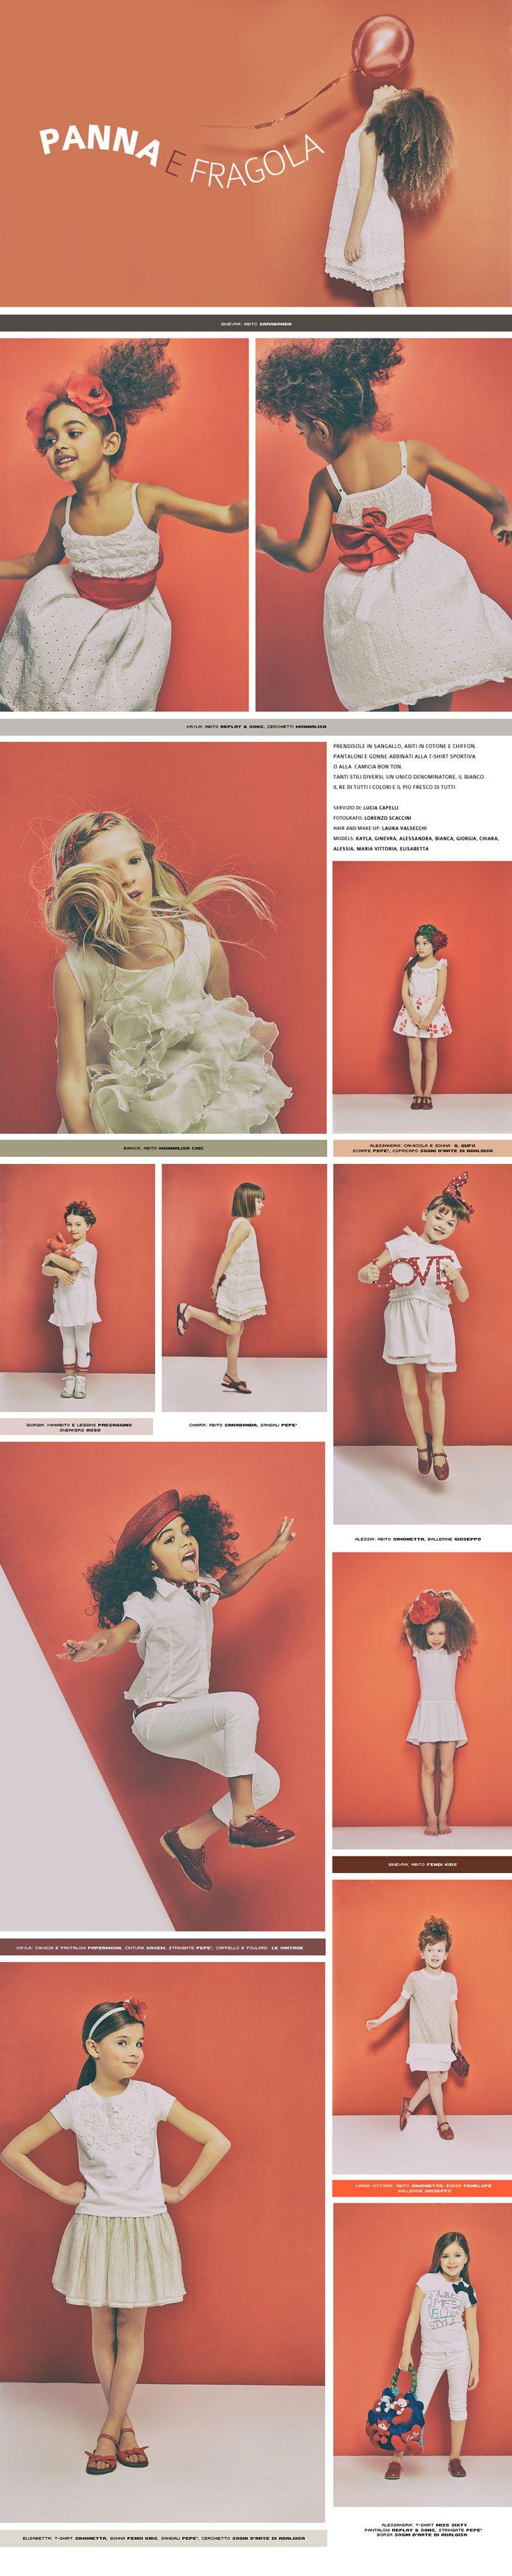 Panna&Fragola #trends #ss14